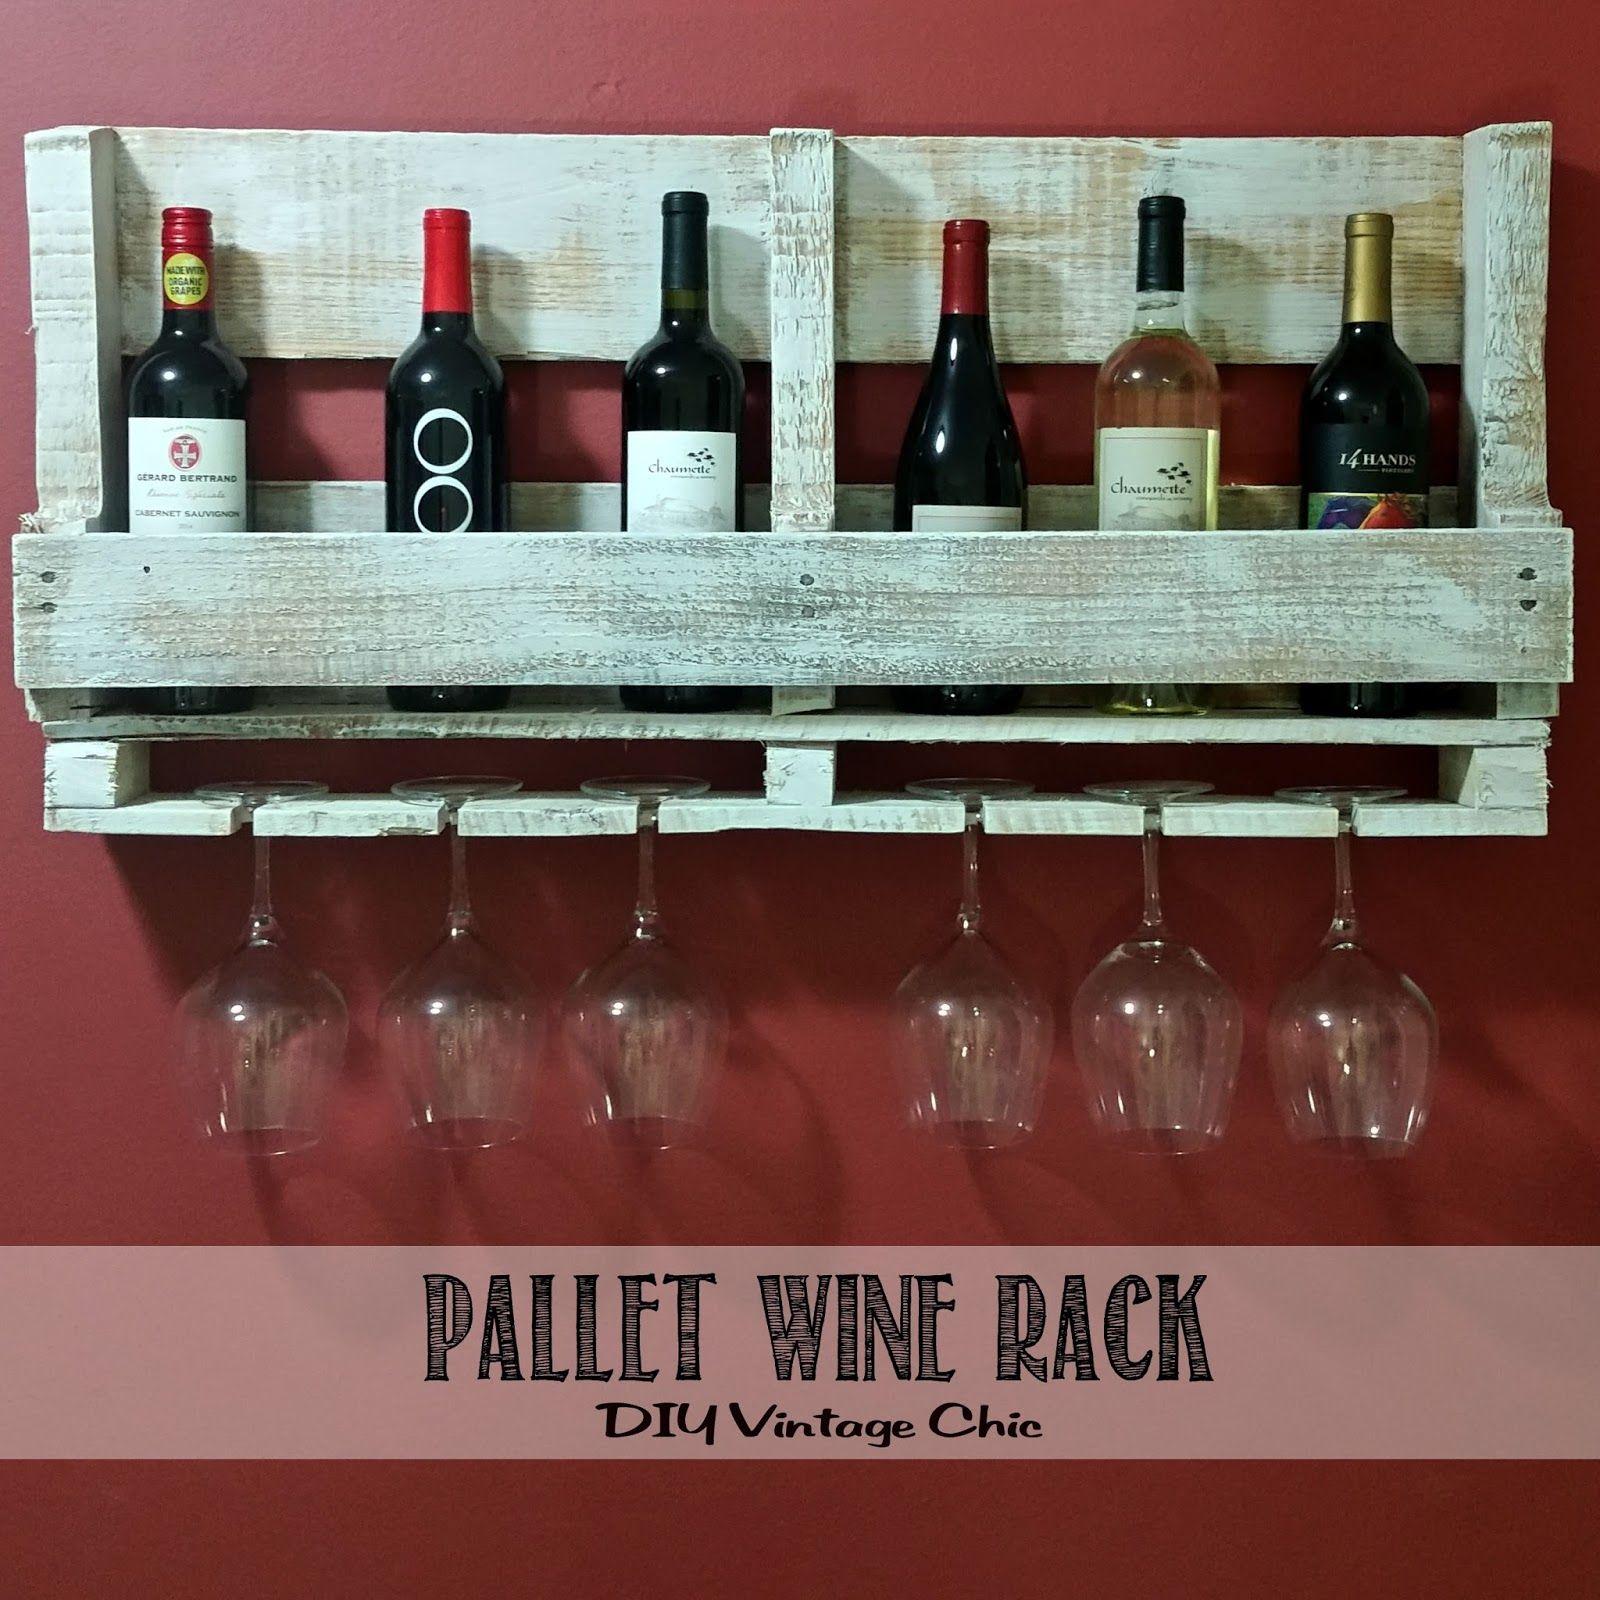 pallet wine rack instructions. Pallet Wine Rack. Diy Vintage Chic: Rack Instructions